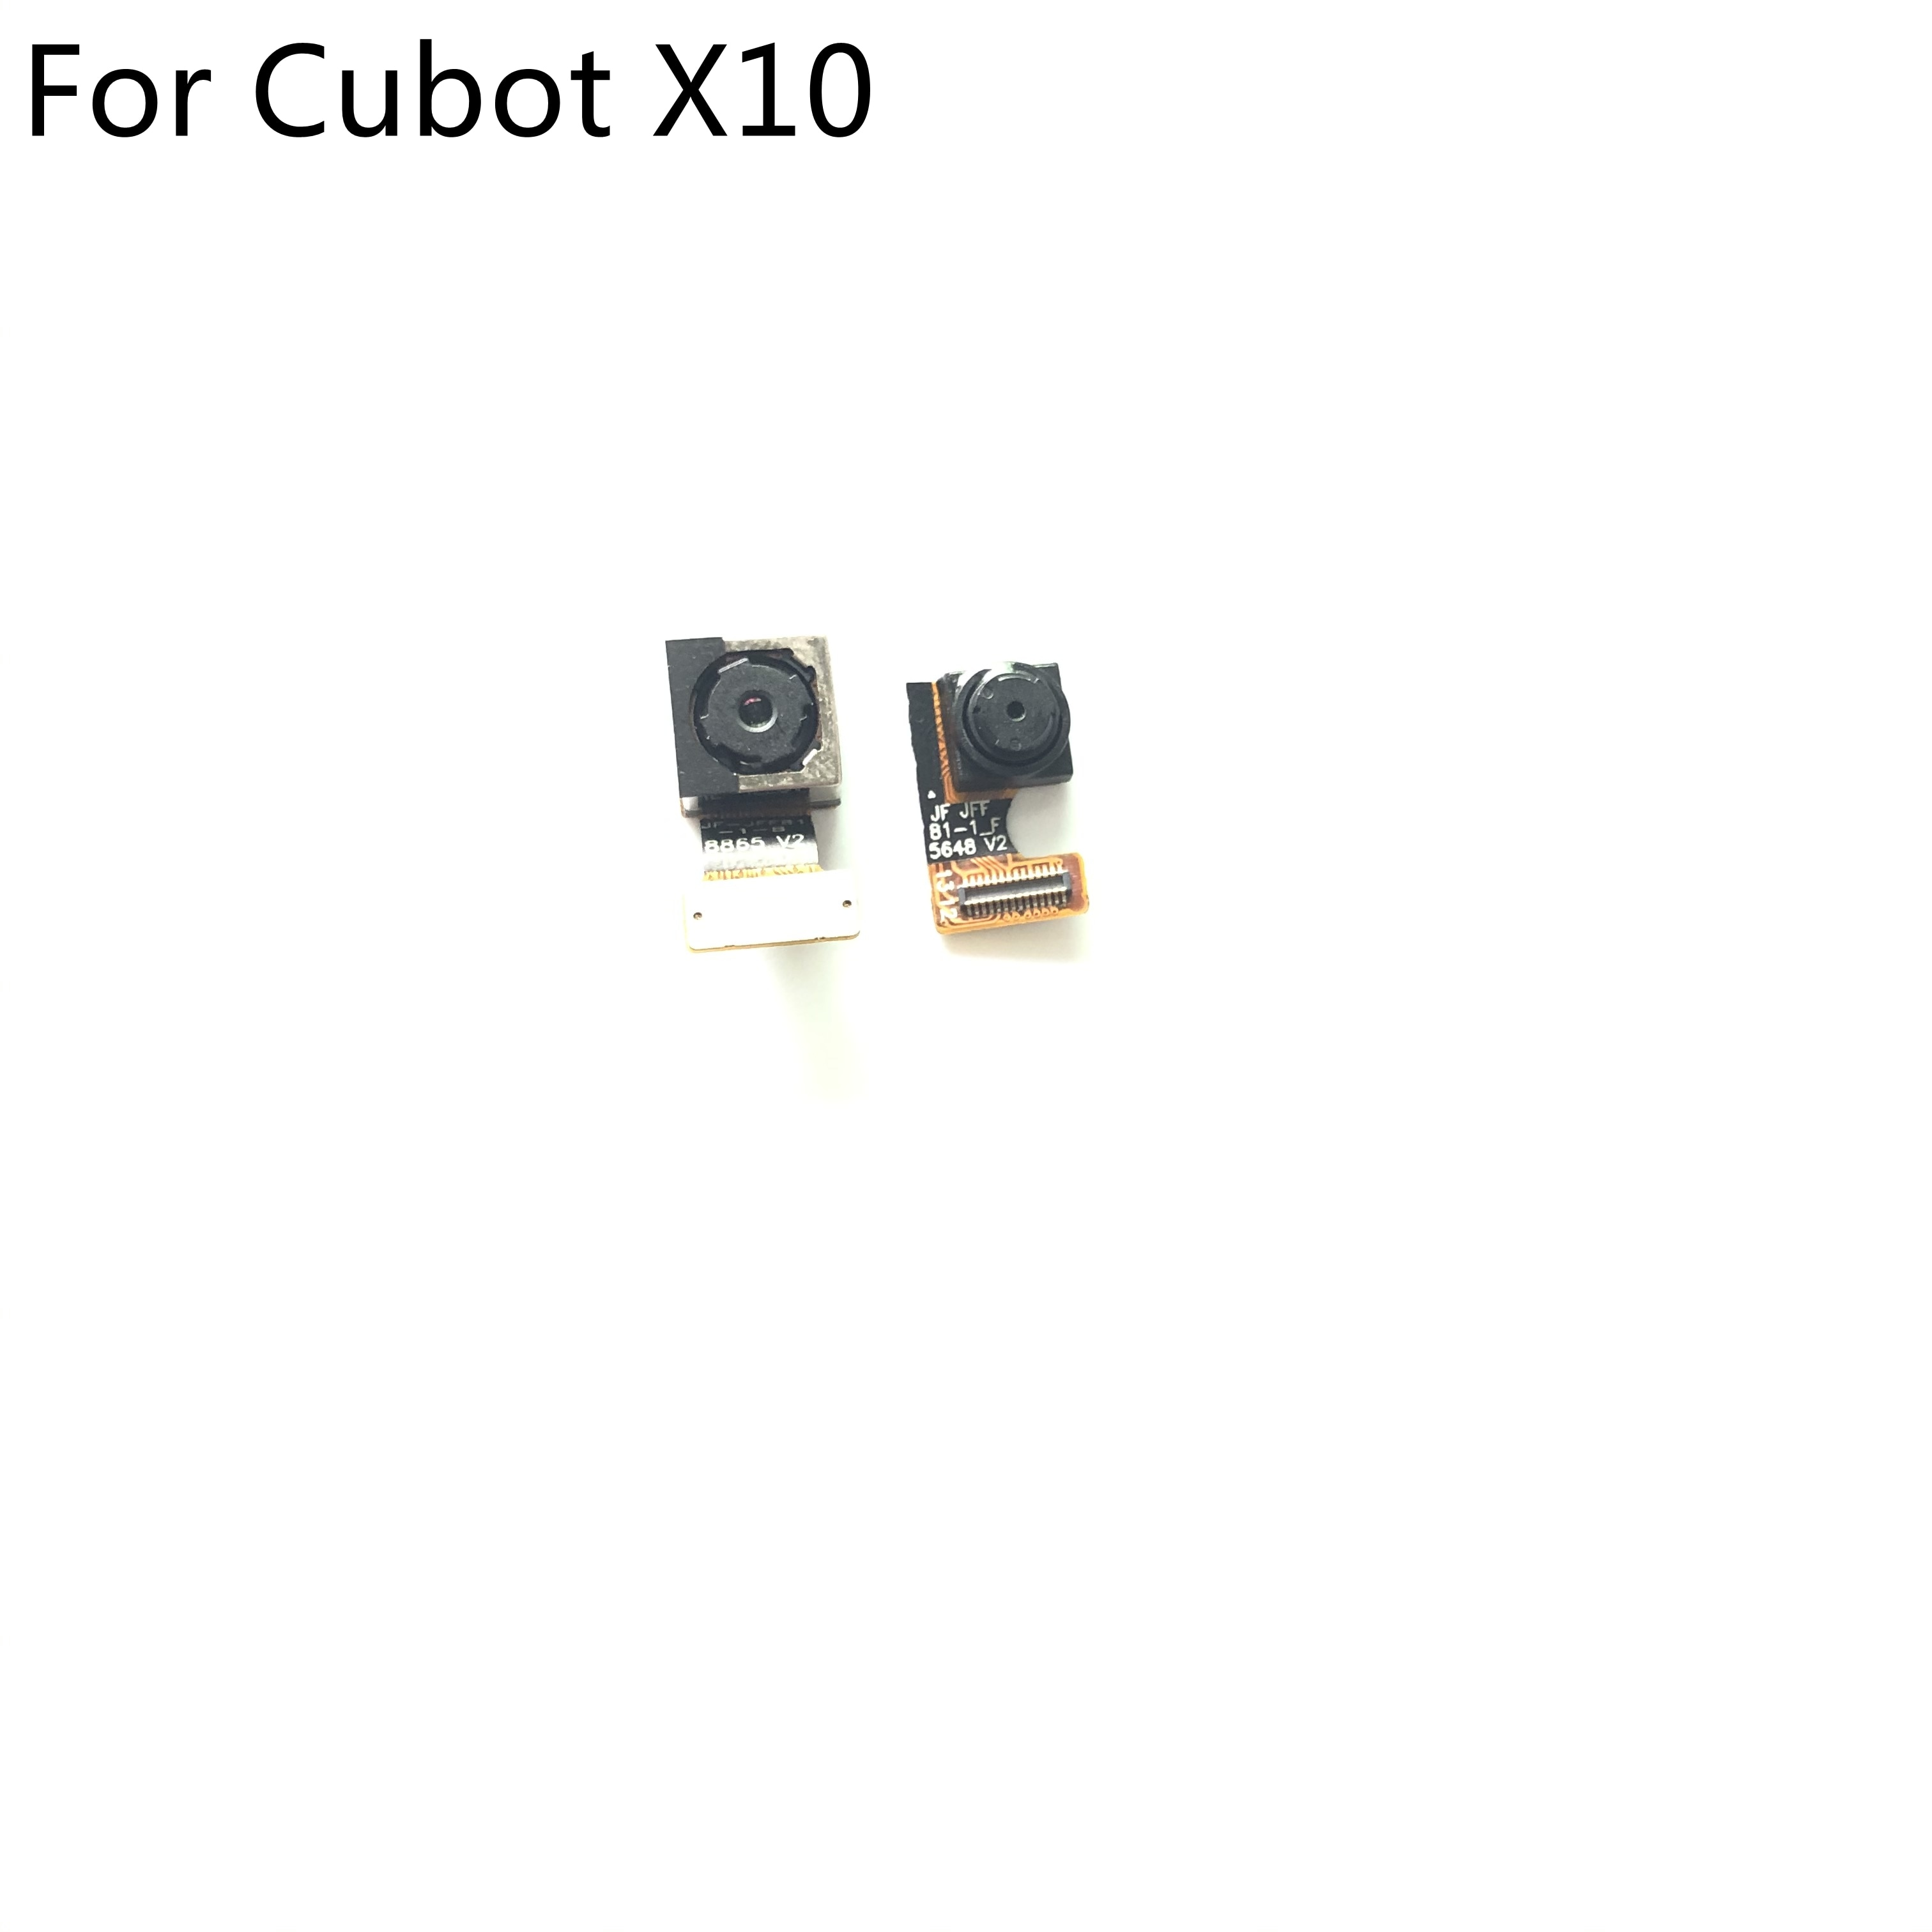 "Cubot x10 usado voltar câmera 13.0mp + câmera frontal 8.0mp módulo para cubot x10 mt6592 5.50 ""720x1280 smartphone"